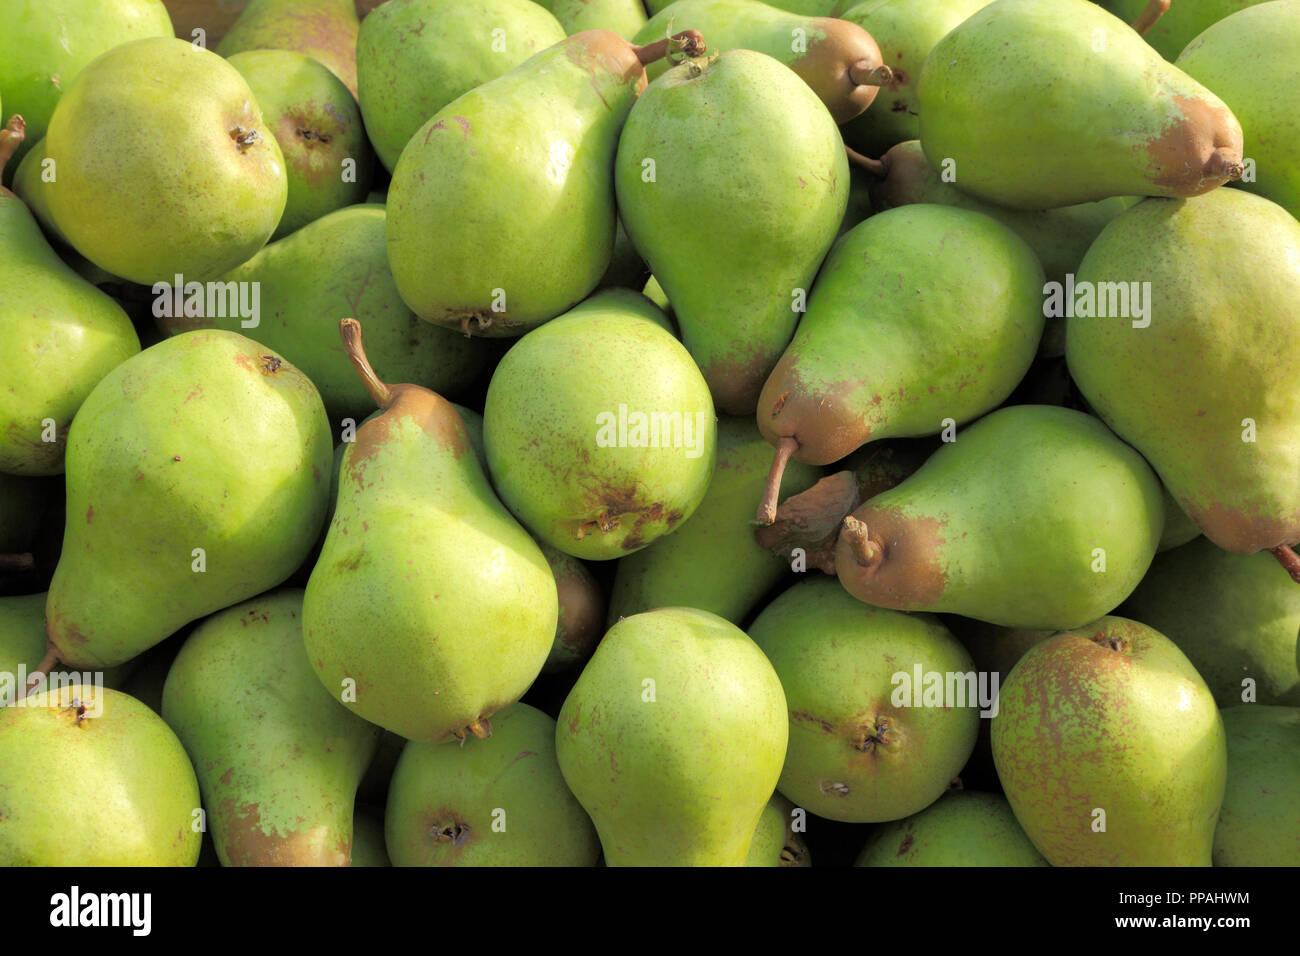 Pear, pears, Mertons Pride, pyrus, farm shop display, edible, fruit - Stock Image